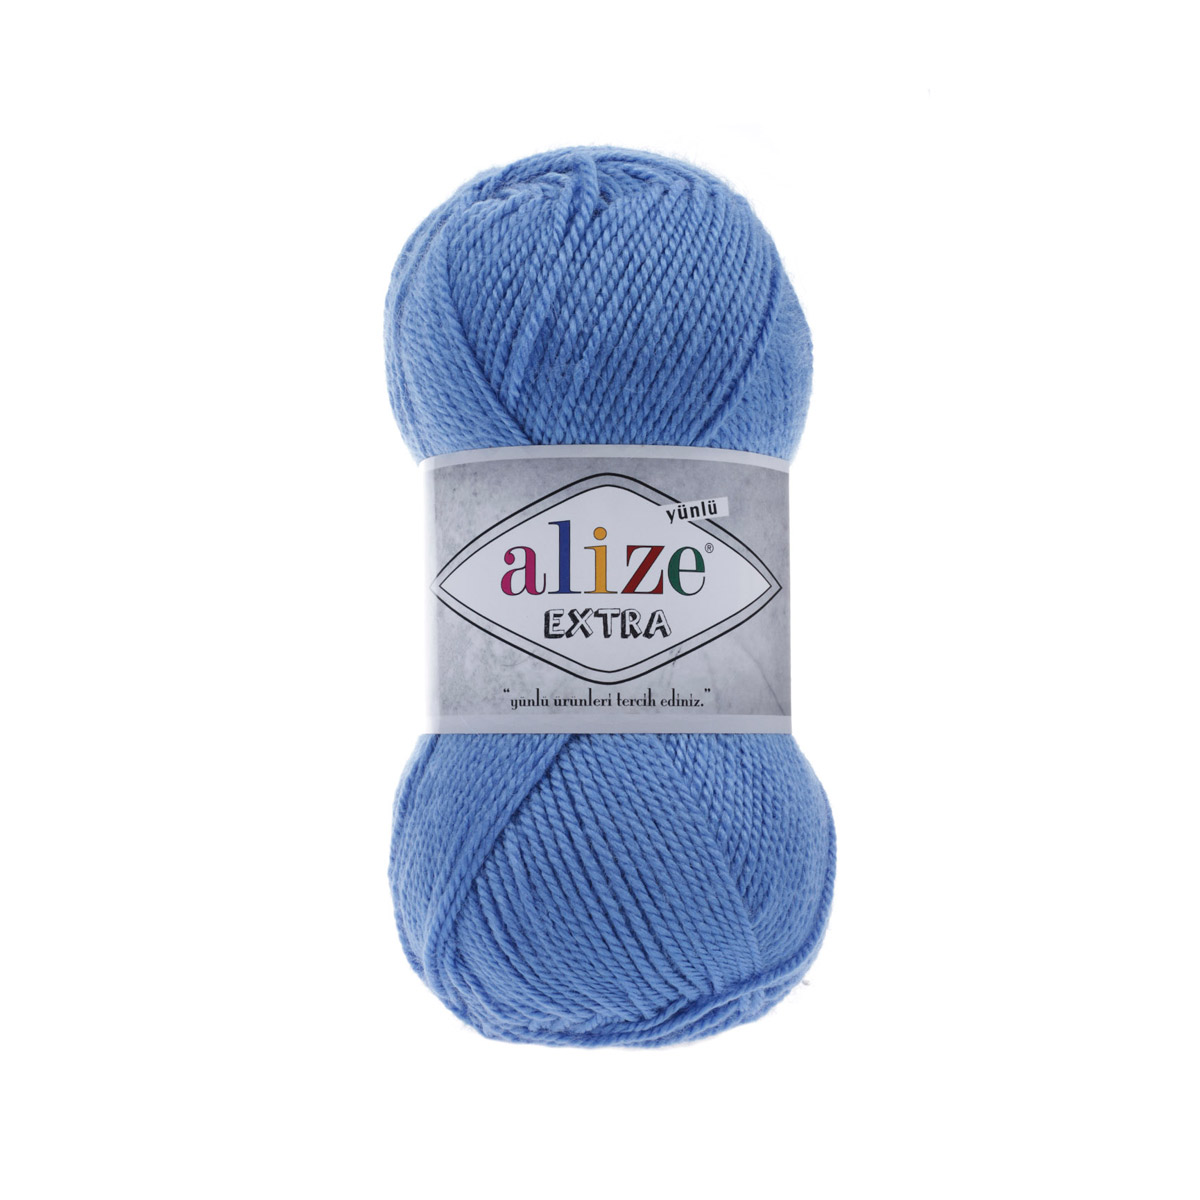 Пряжа ALIZE 'EXTRA' 100гр. 220м (90% Aкрил - 10% Шерсть)